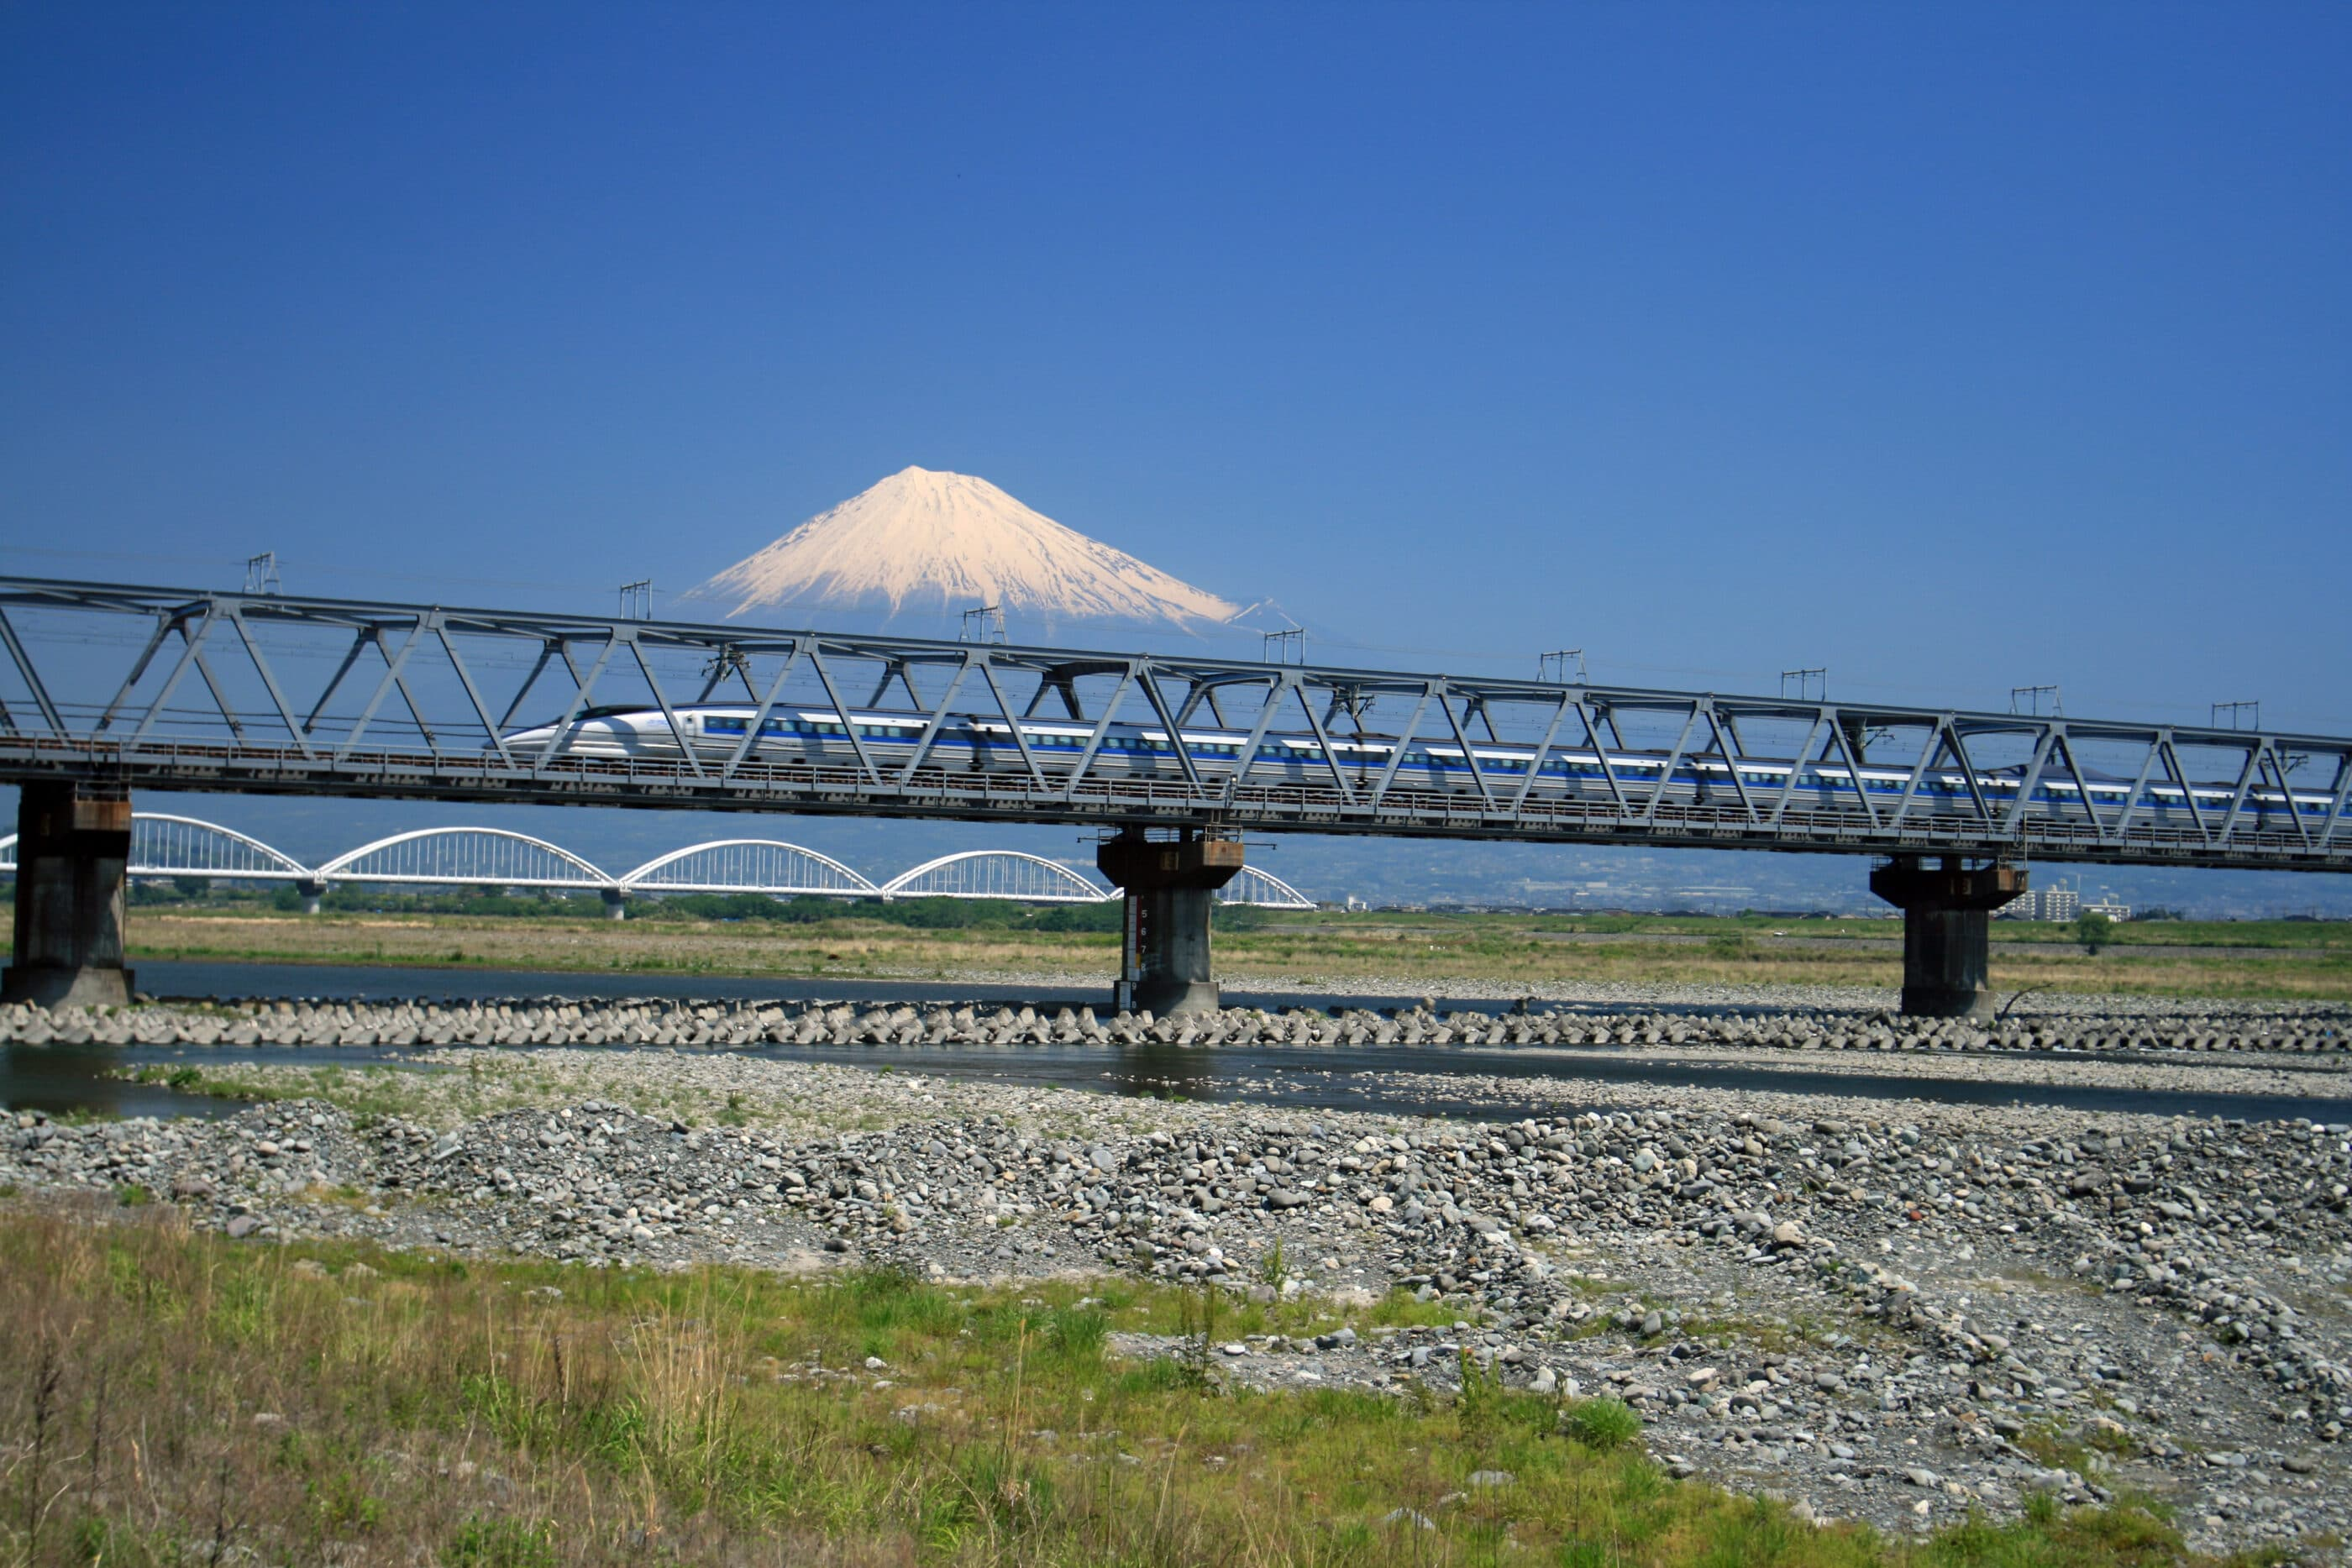 A shinkansen bullet train passing by Mt. Fuji